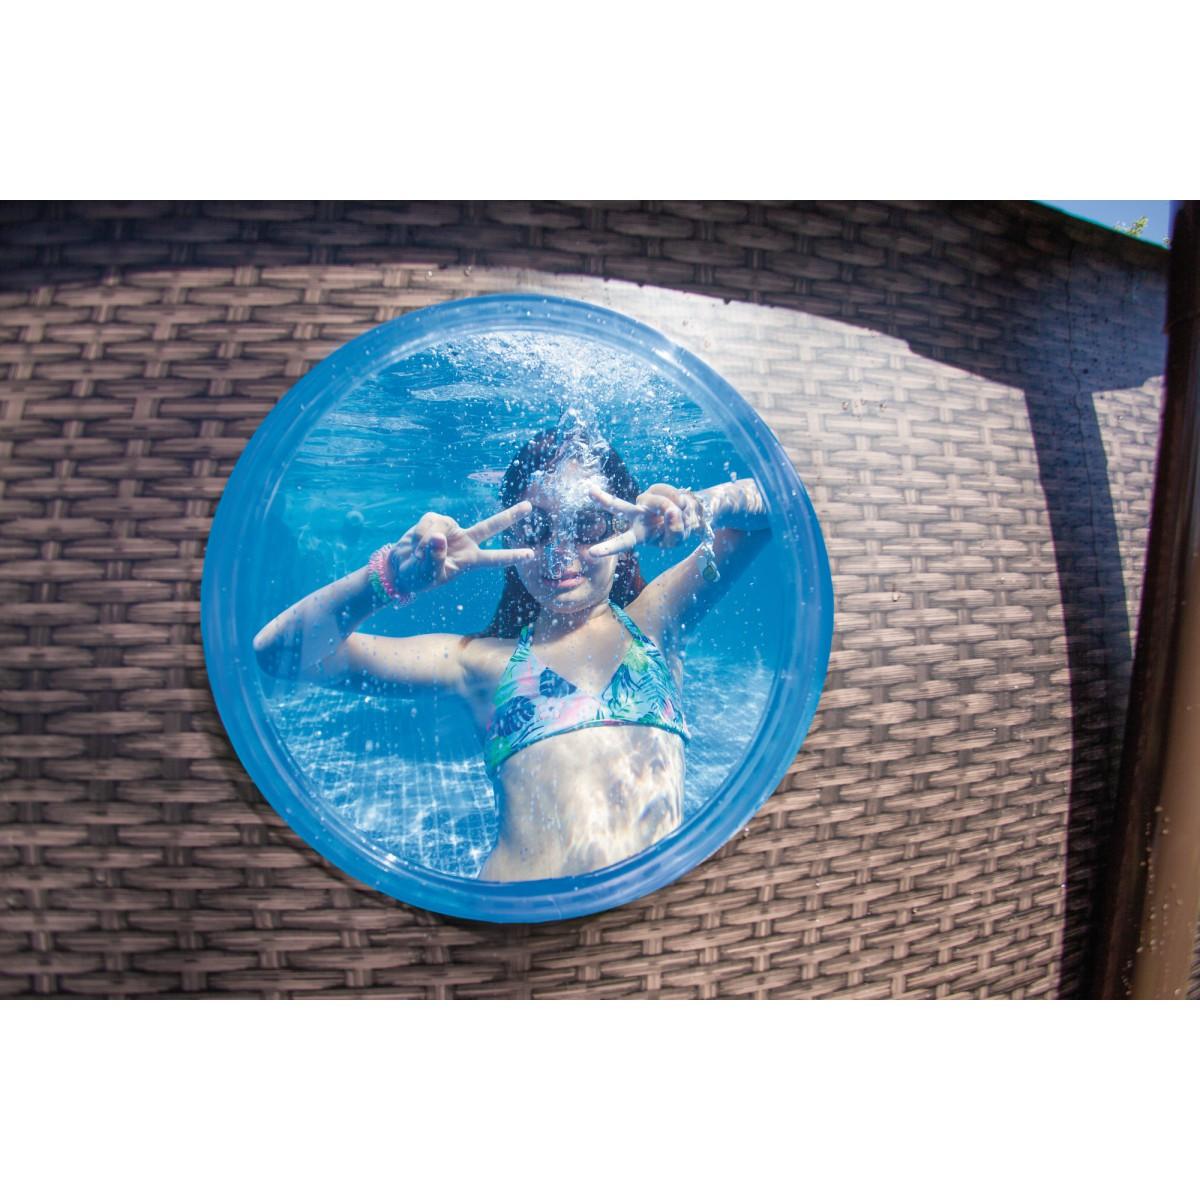 Piscine ronde tubulaire Power Steel Swim Vista Bestway - Ø488 x 122 cm